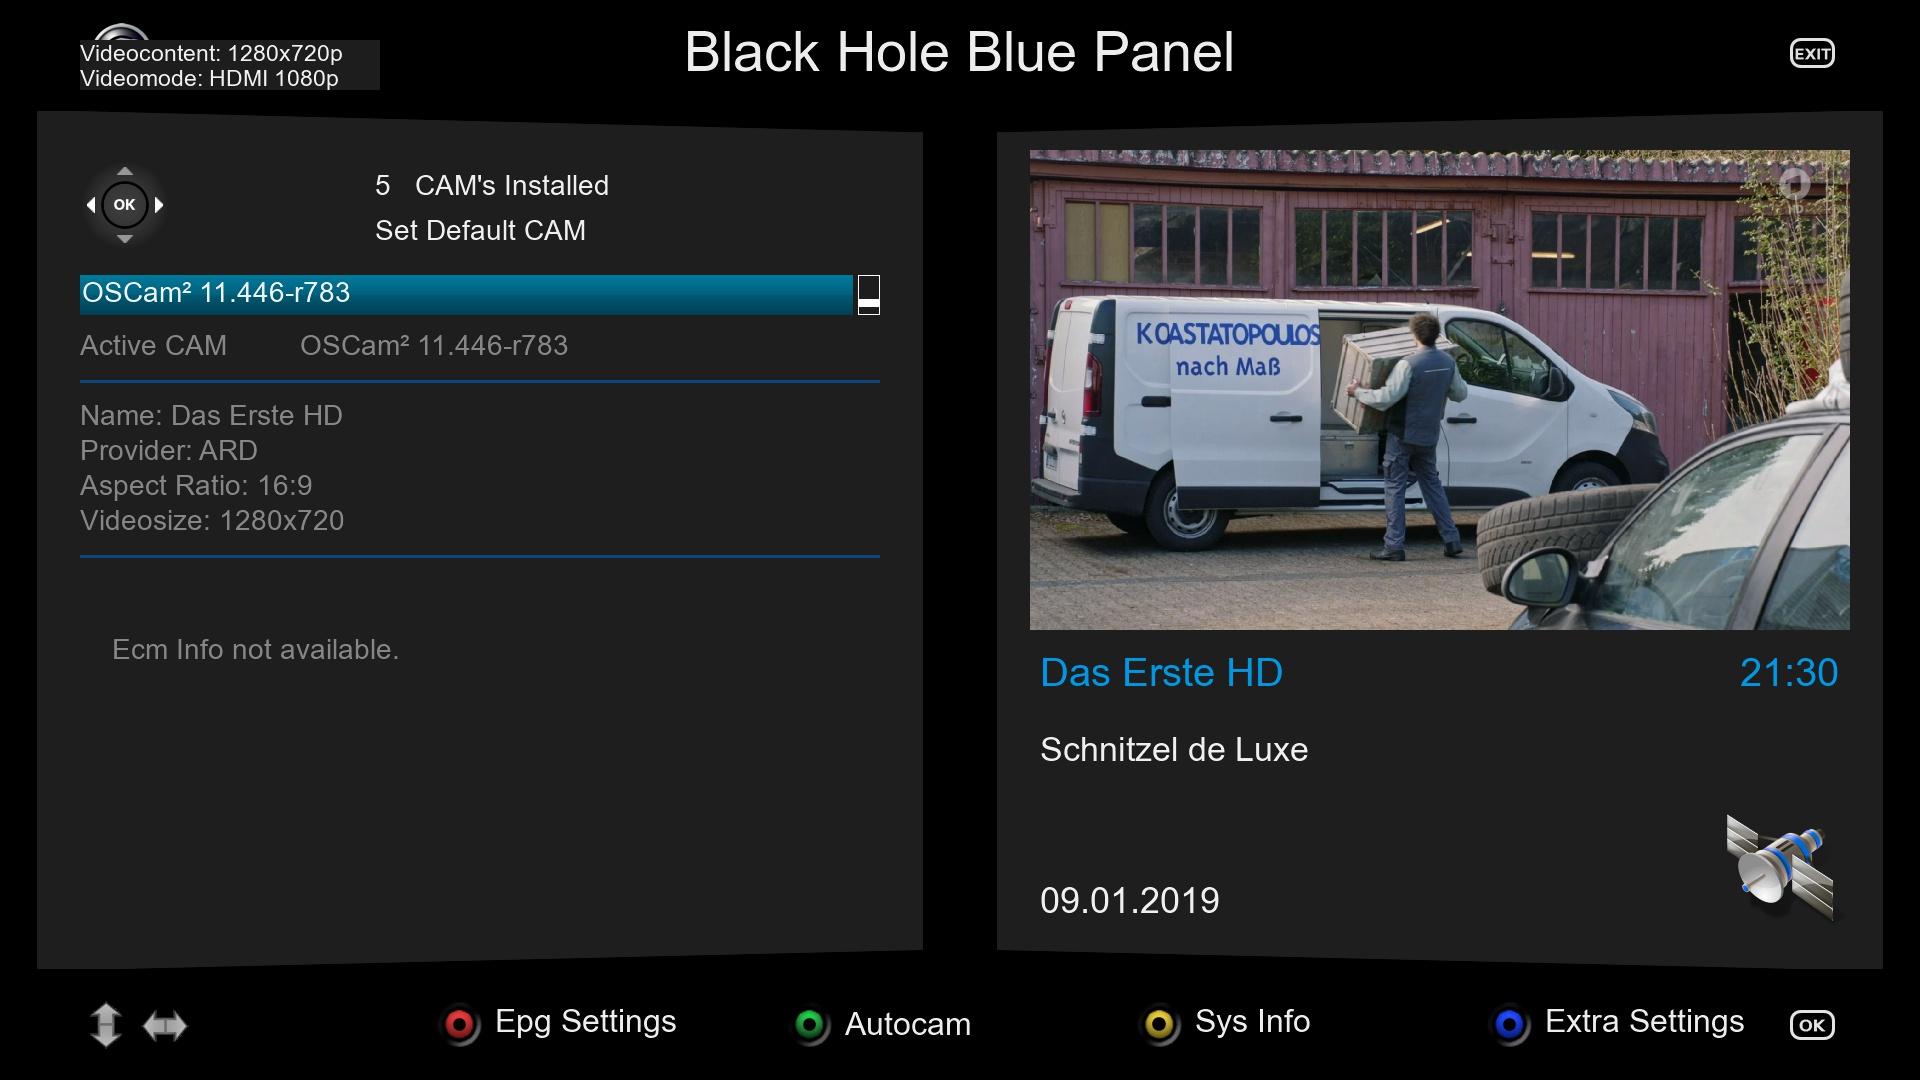 BACKUP] BLACKHOLE 3 0 8 for Vu+ UNO 4K SE (VUPLUS4K) – VUPLUS4K